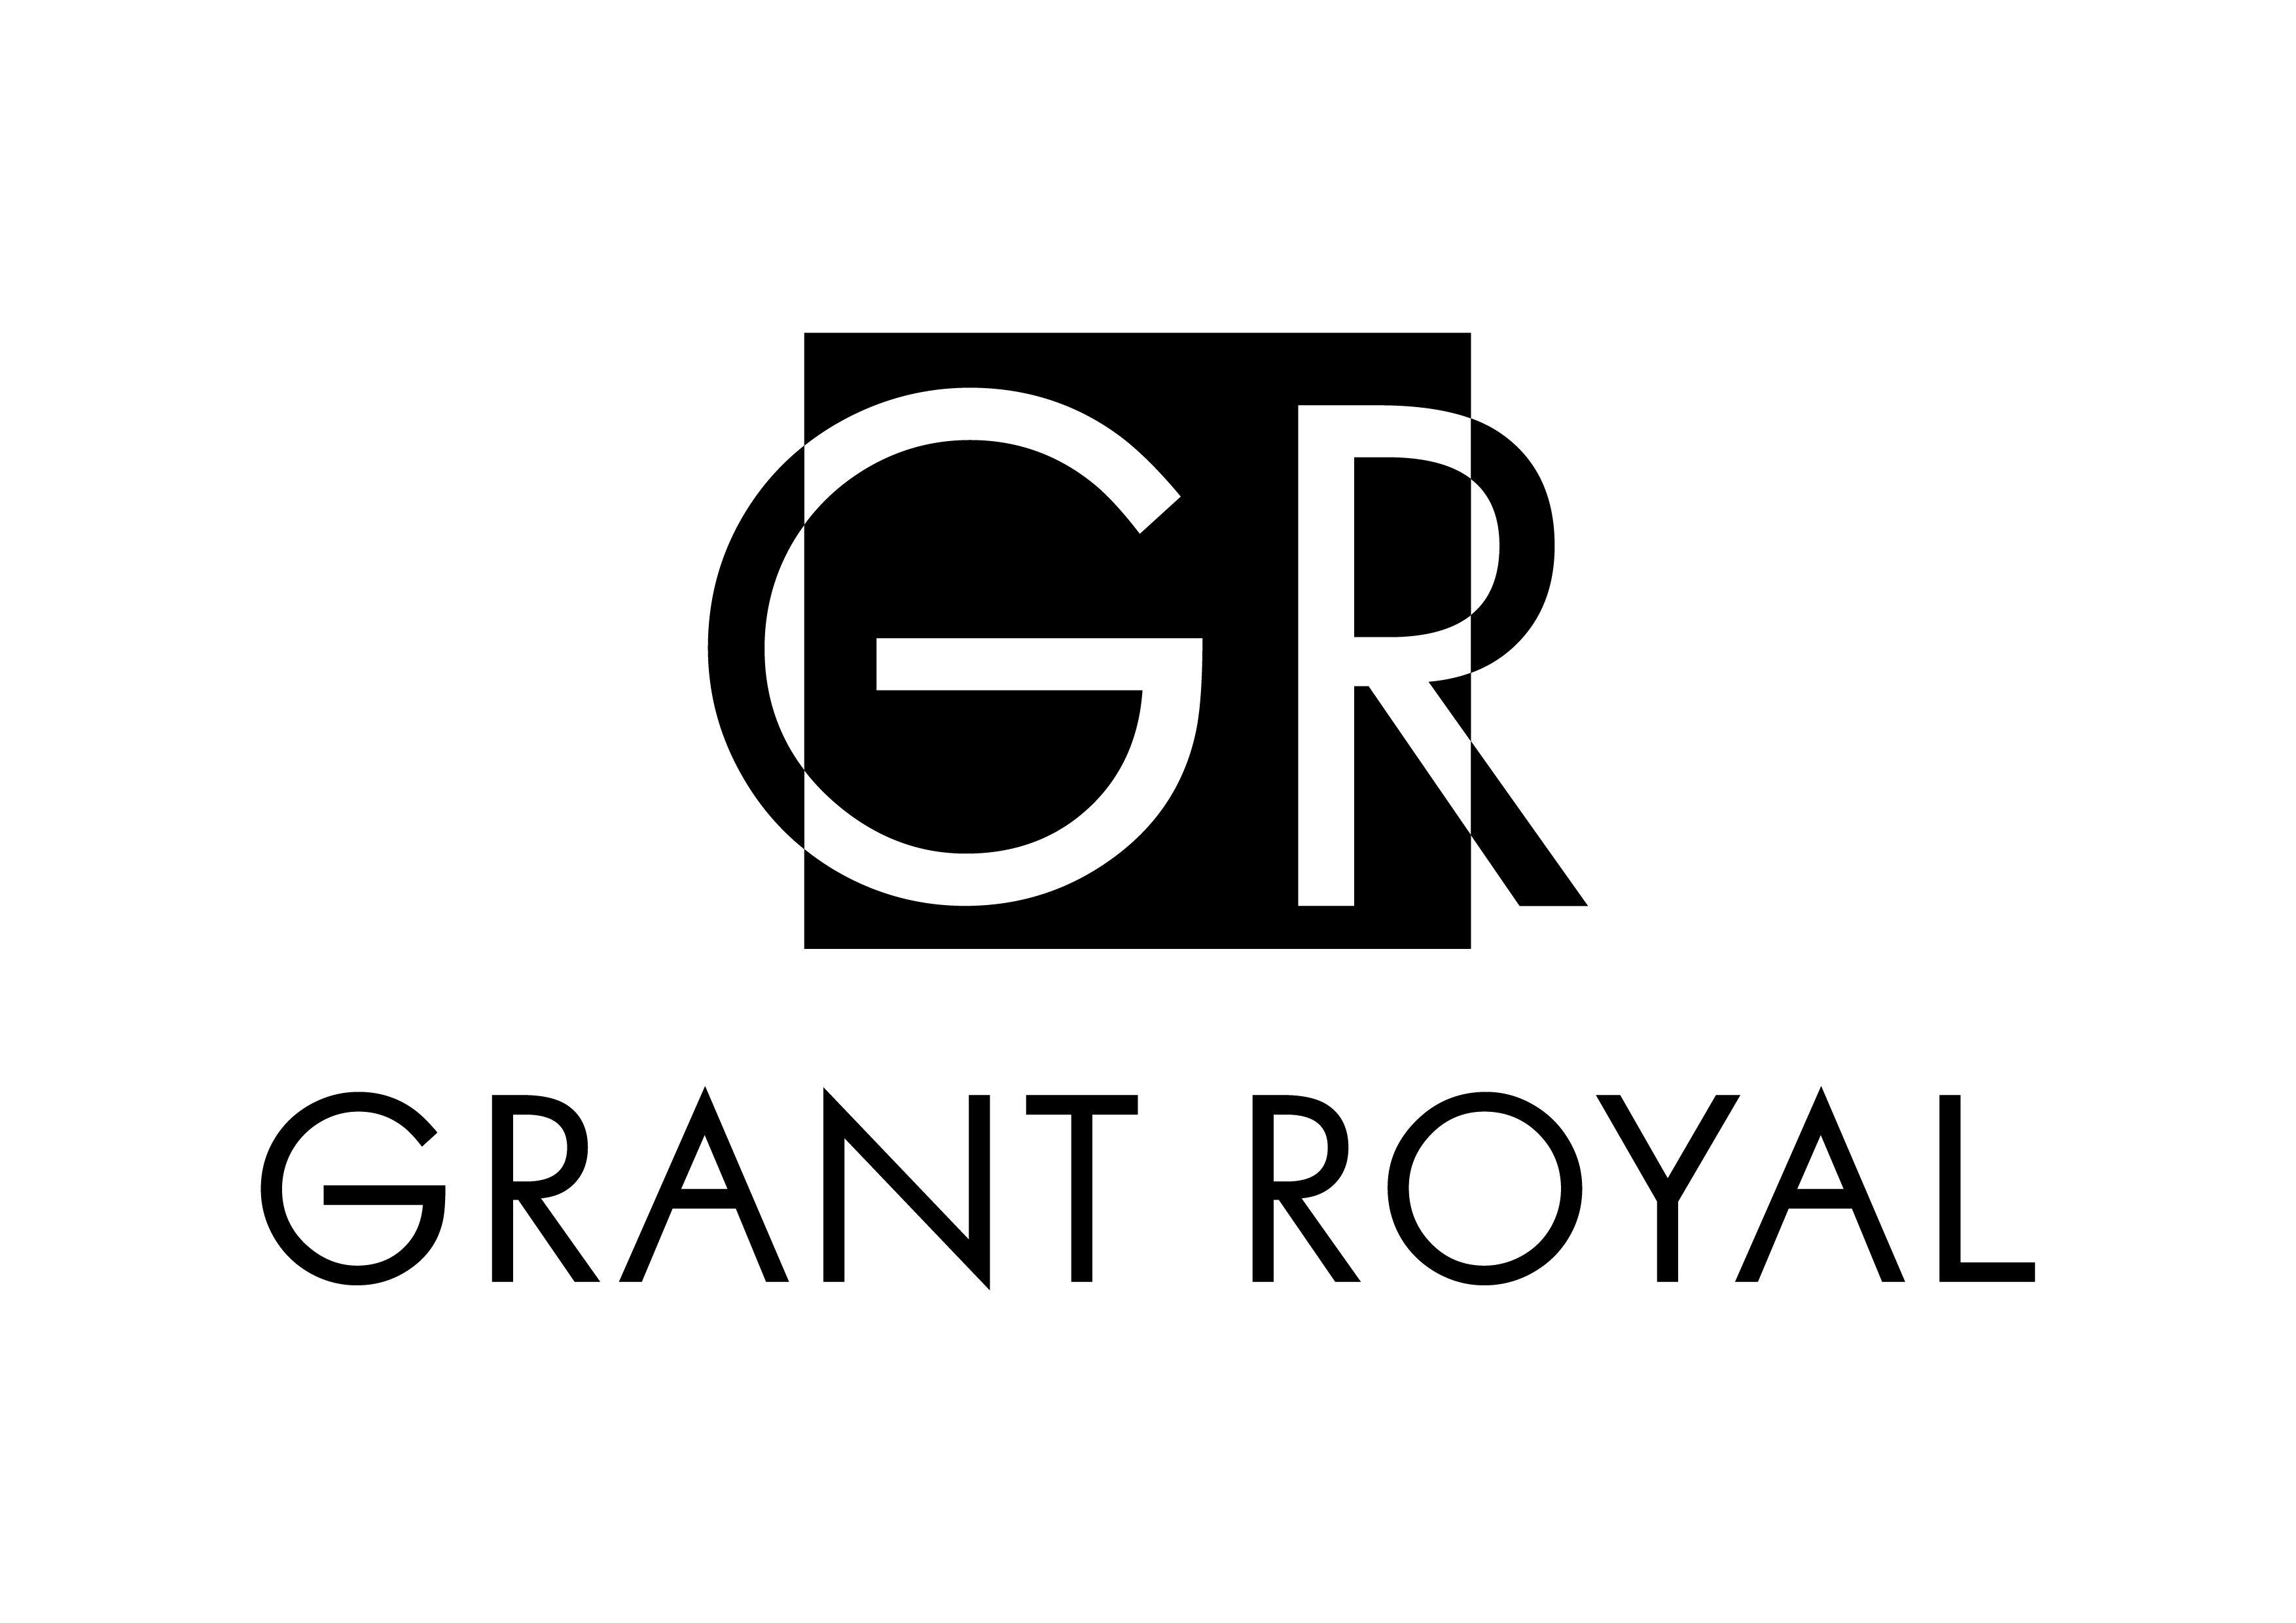 Grant Royal